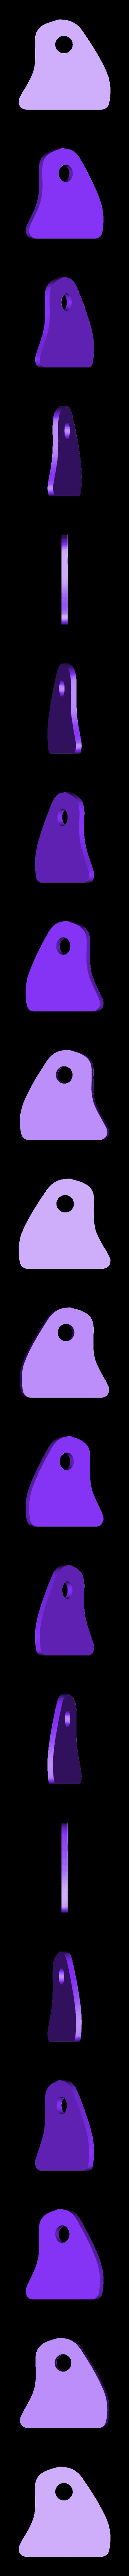 parrot_body.STL Download free STL file party parrot automata • 3D printable design, melonshu